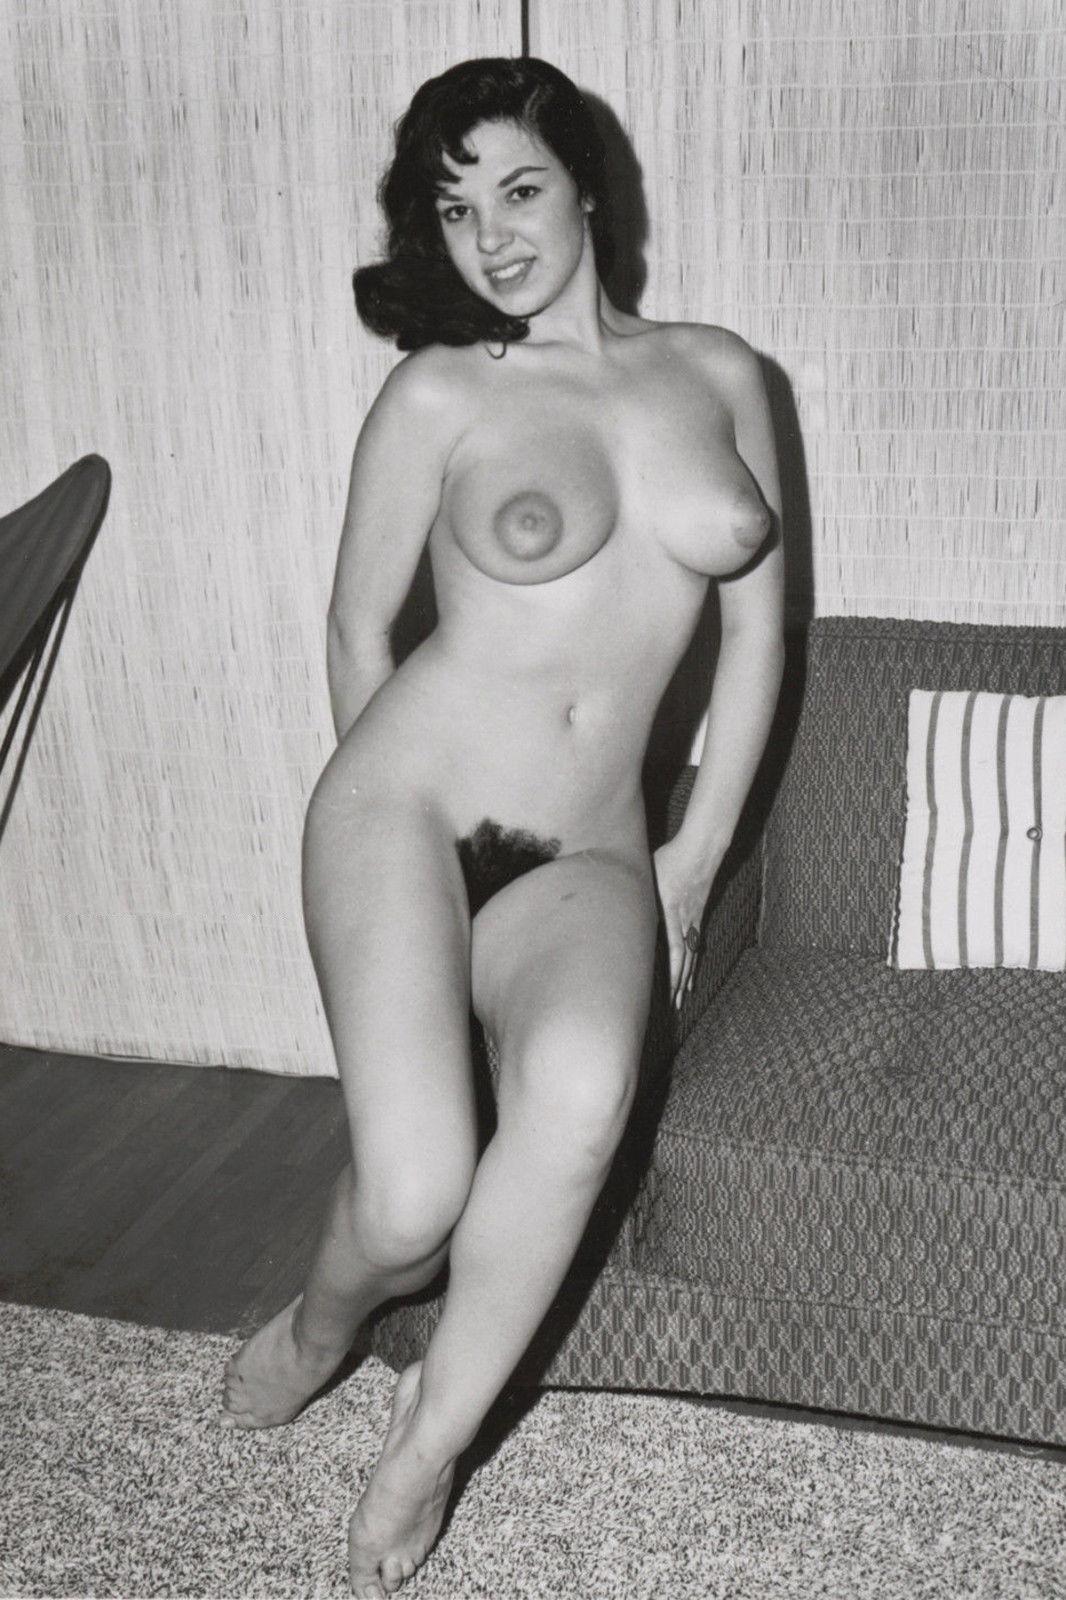 Angelique Pettyjohn Topless alicyn sanborn topless | vintagecutiesblog